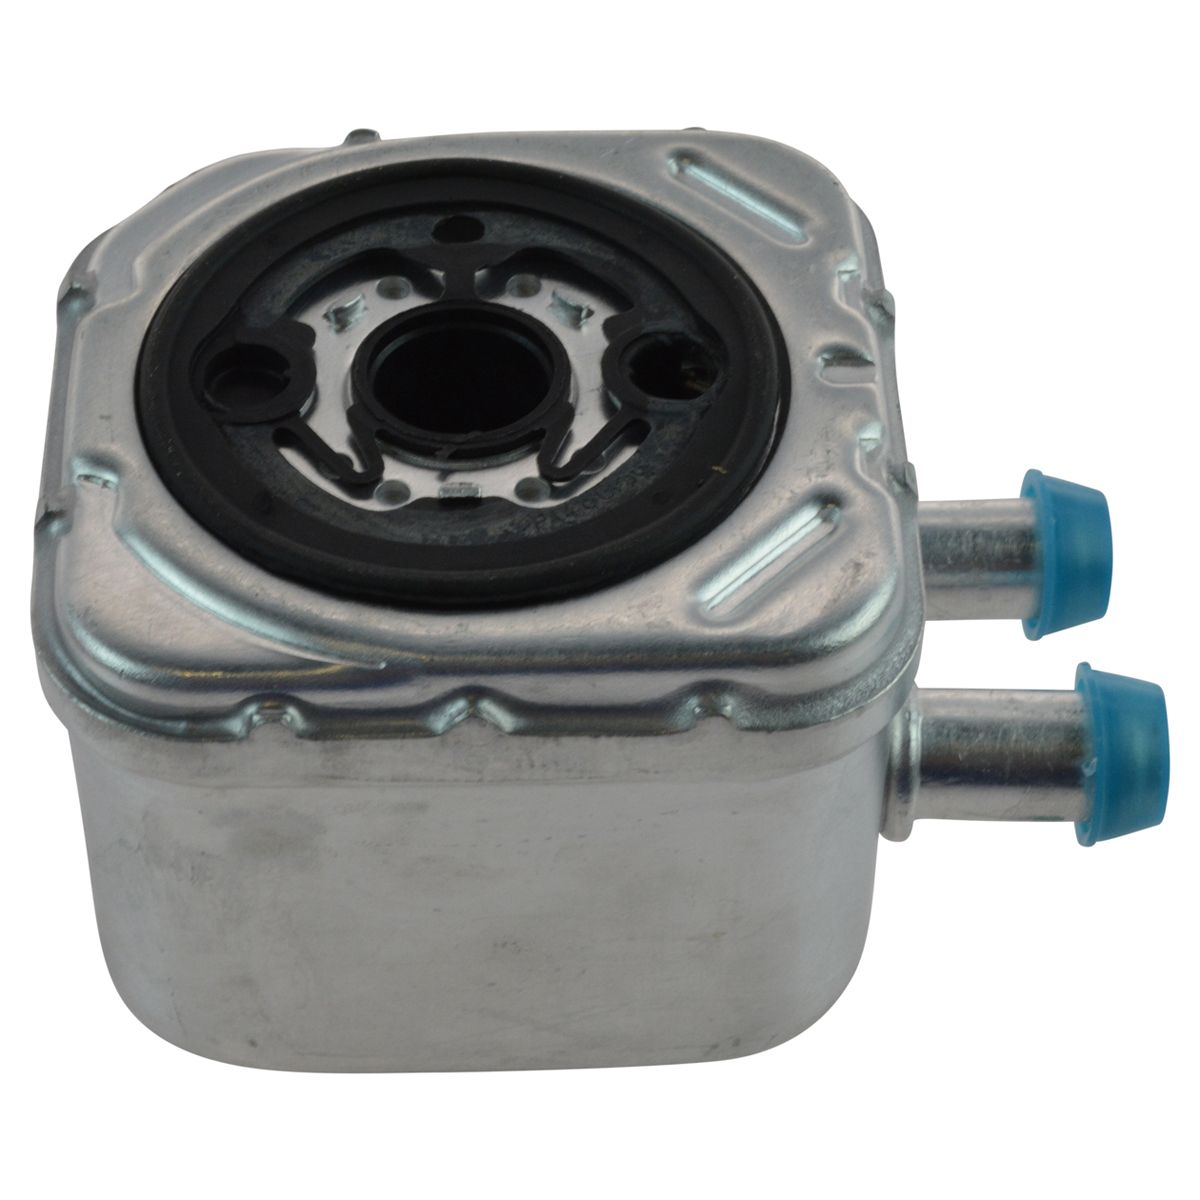 Engine Oil Cooler Assembly For Audi S4 A4 A6 TT Allroad VW Passat 2.7 2.8 3.0